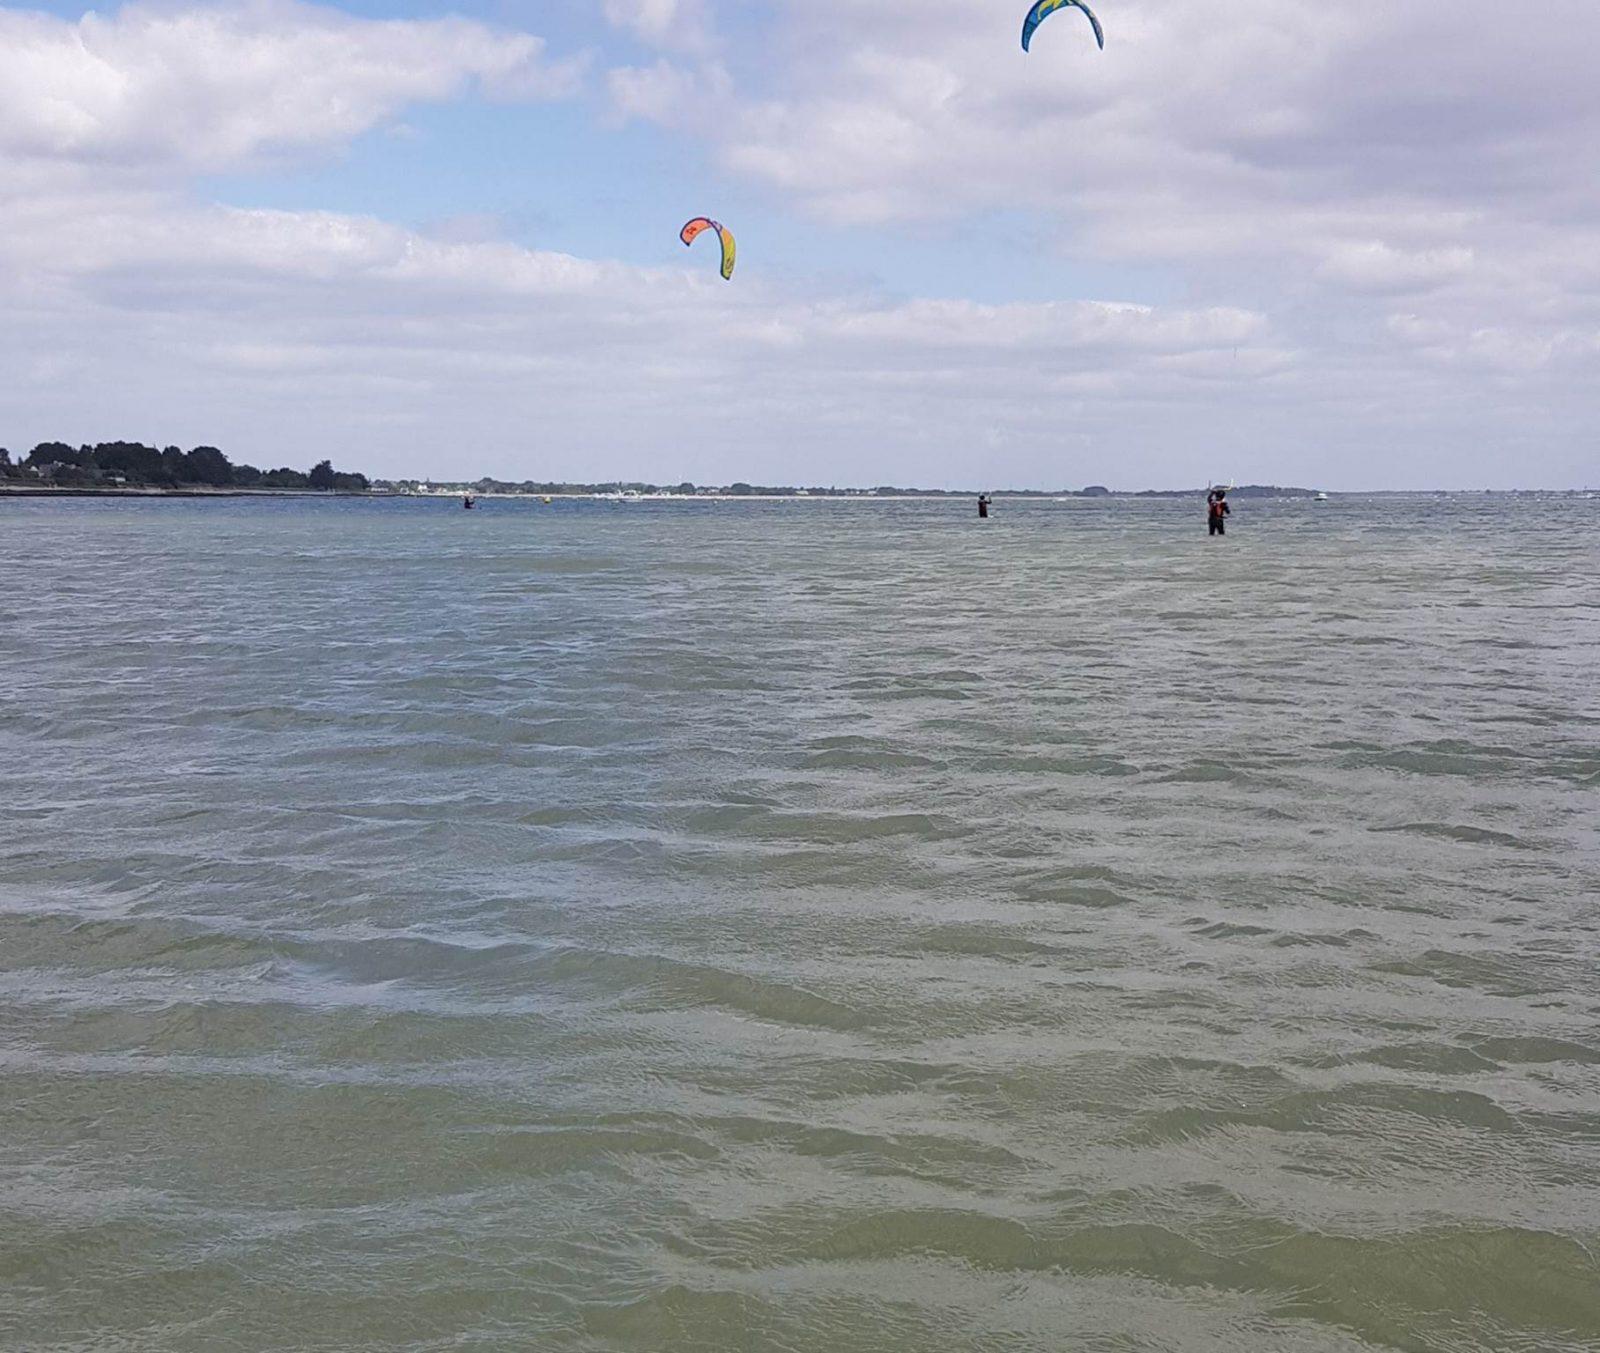 KKS-Kitesurf-Sarzeau-Presqu'île-de-Rhuys-Golfe-du-Morbihan-Bretagne sud